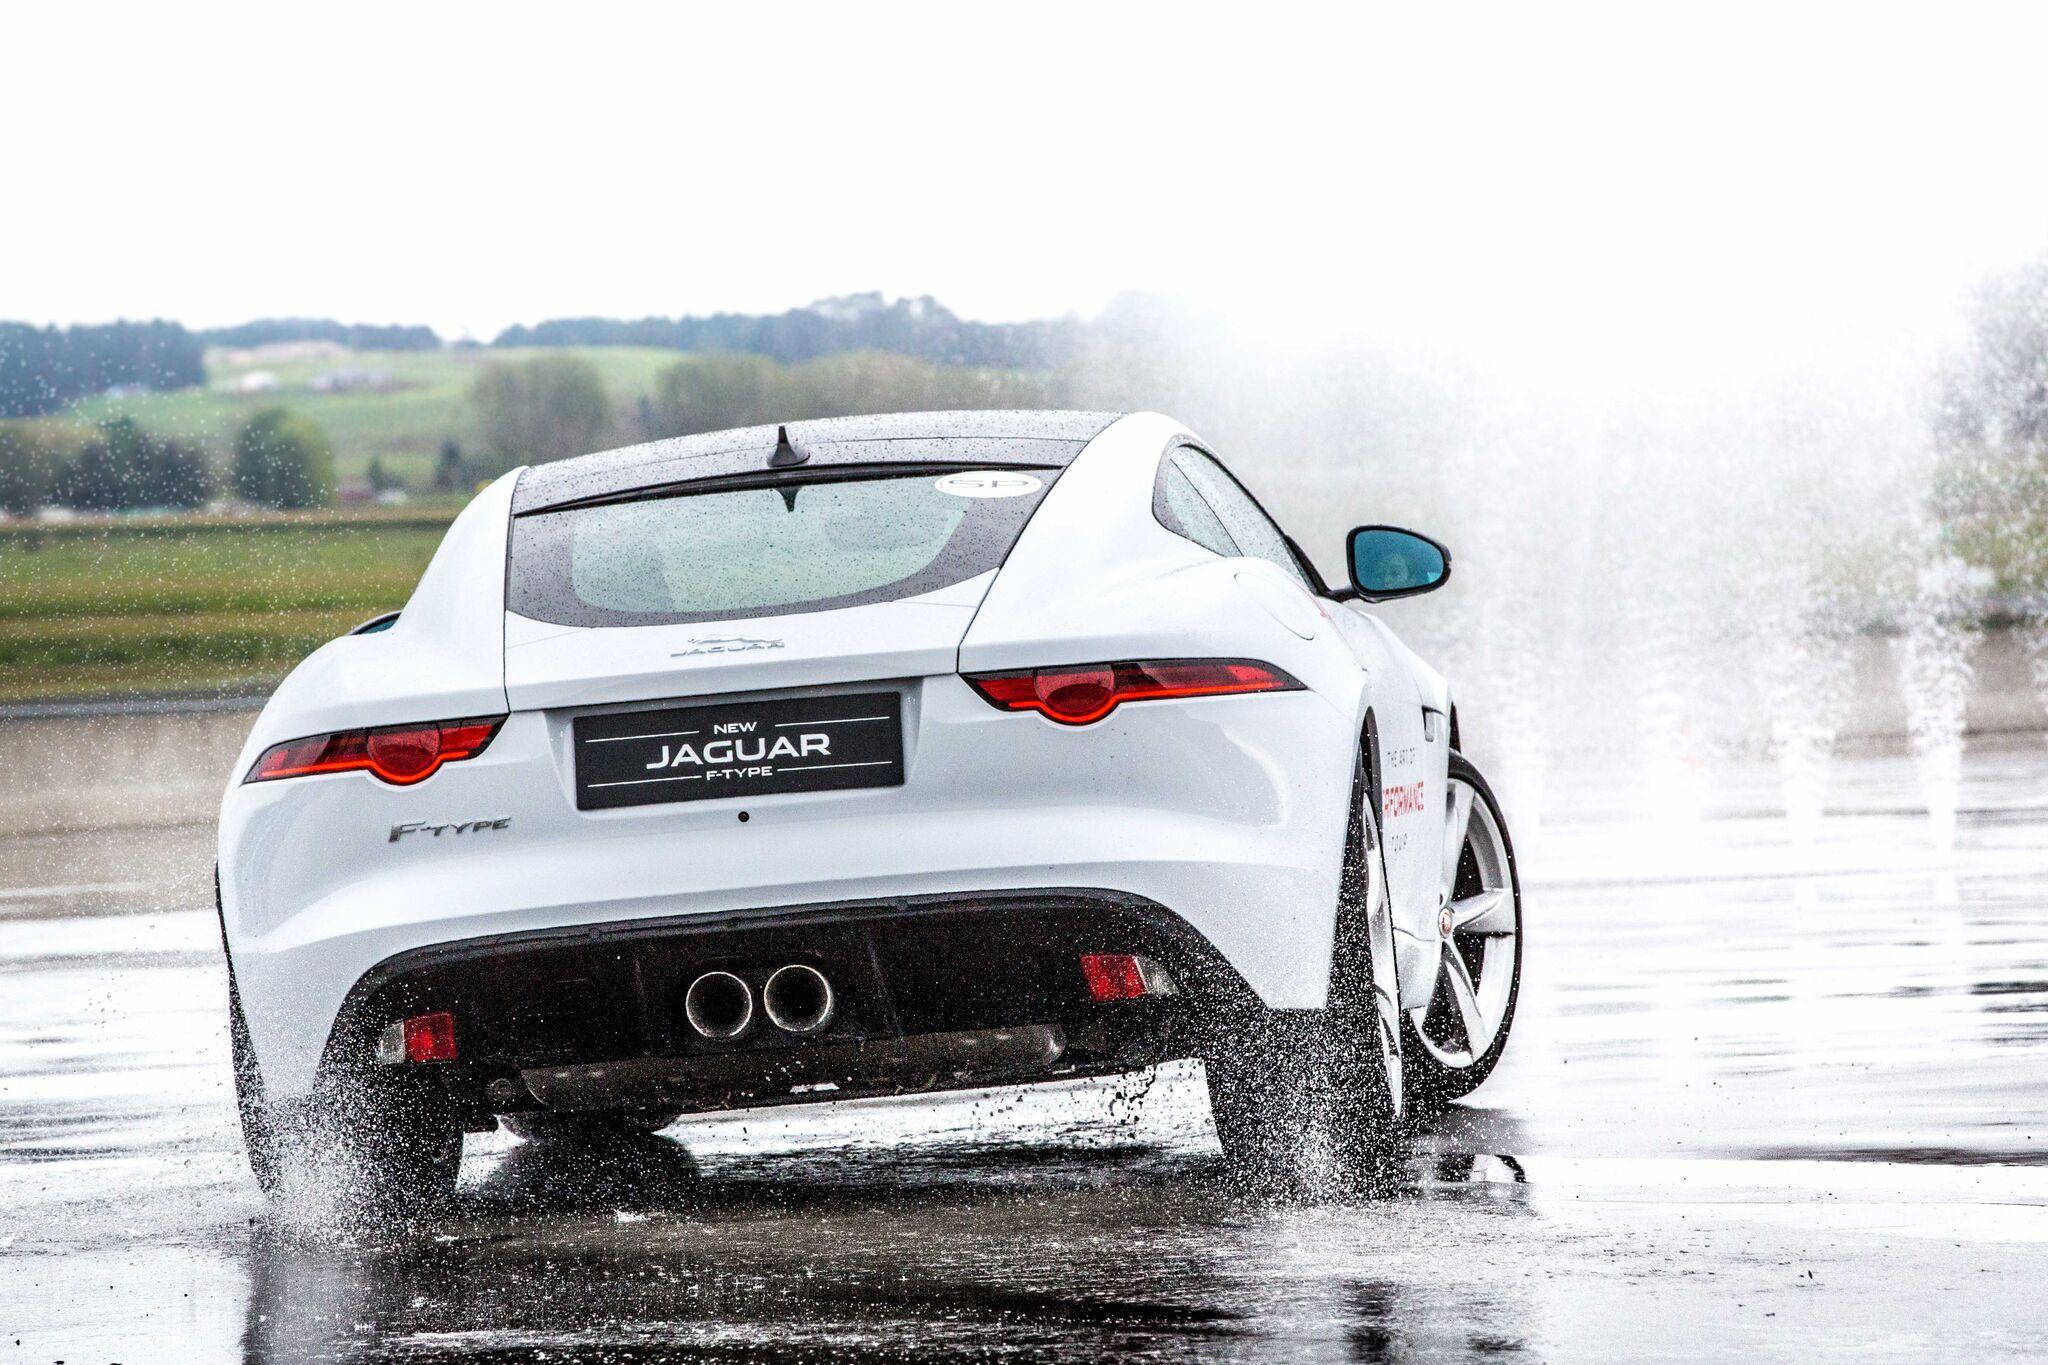 Jaguar - Art of Performance - TUE MORN 2MB-134_preview.jpeg